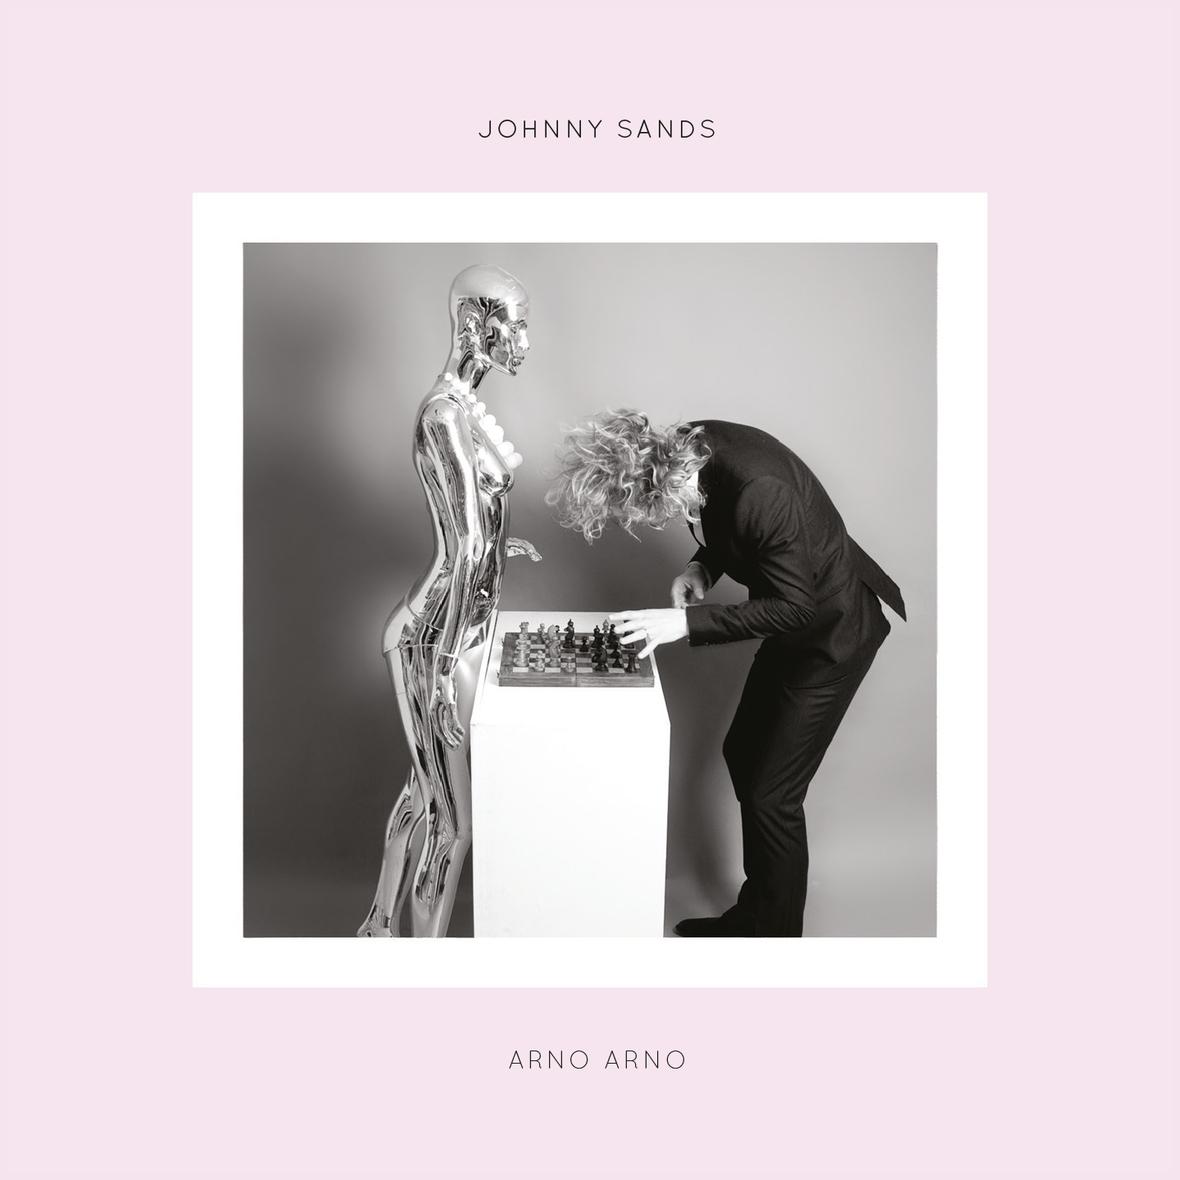 Johnny Sands Arno Arno single art